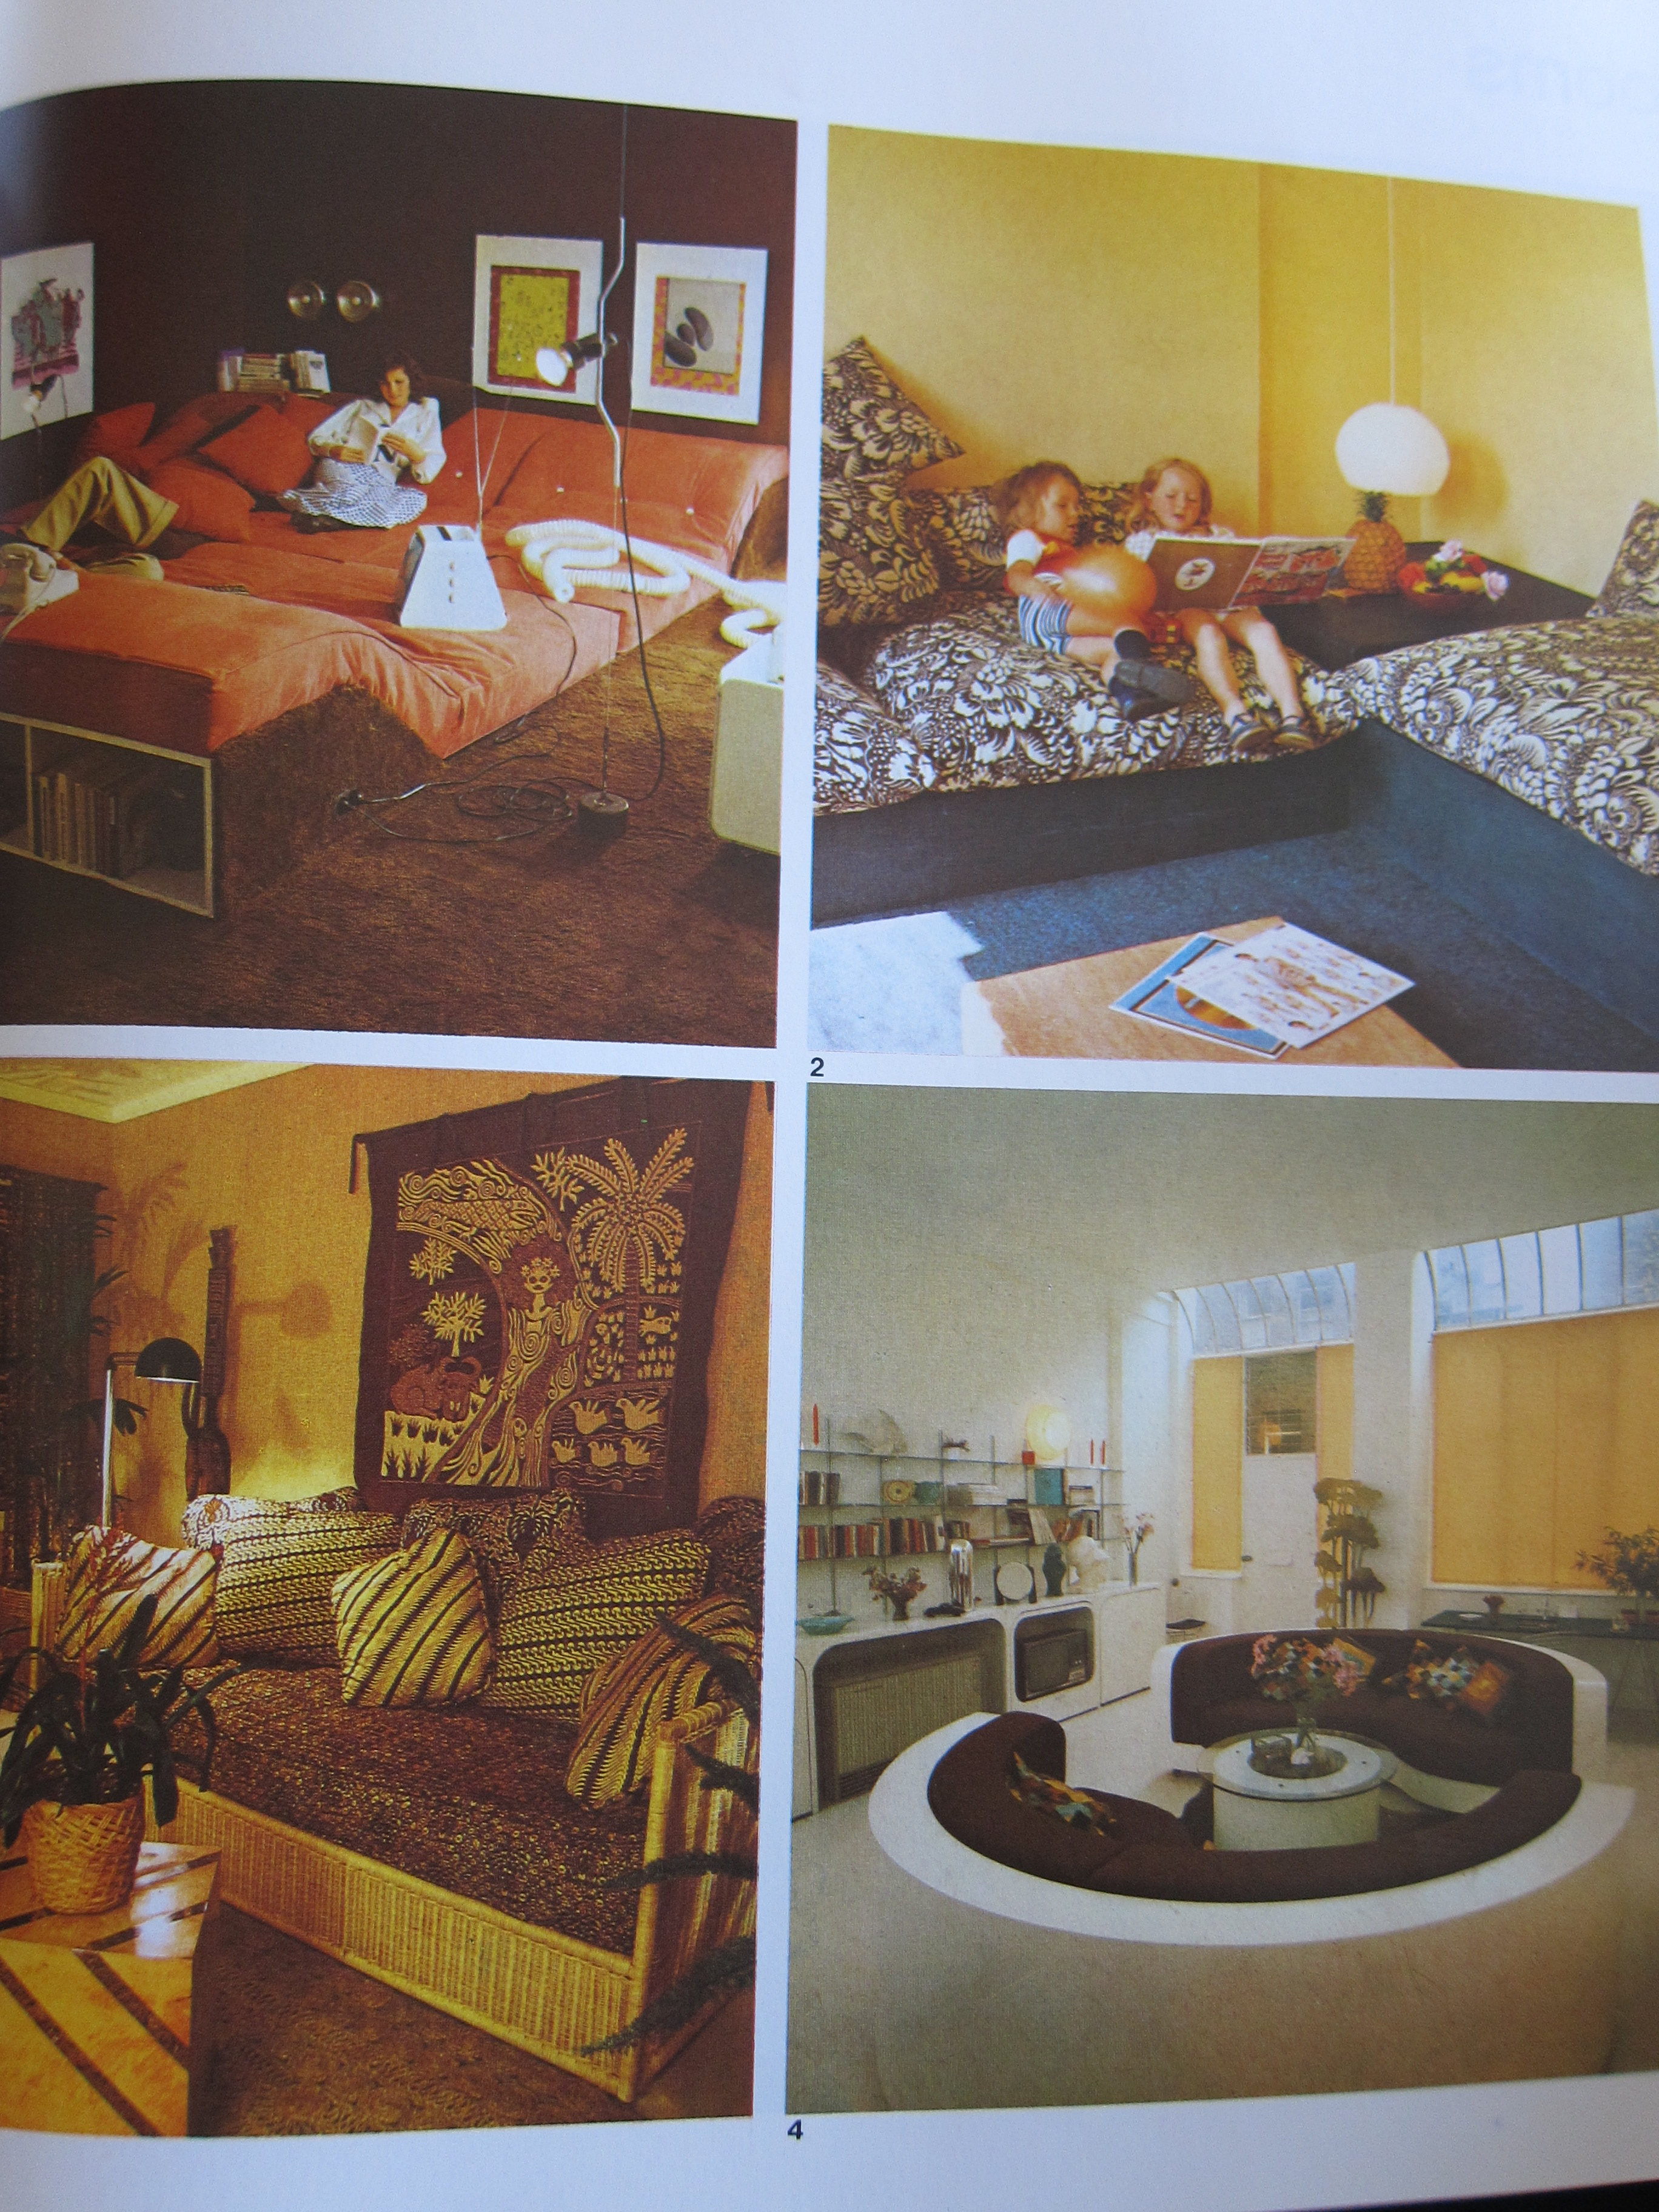 Interior Design Time Warp 1  The 1970s  Interiors for